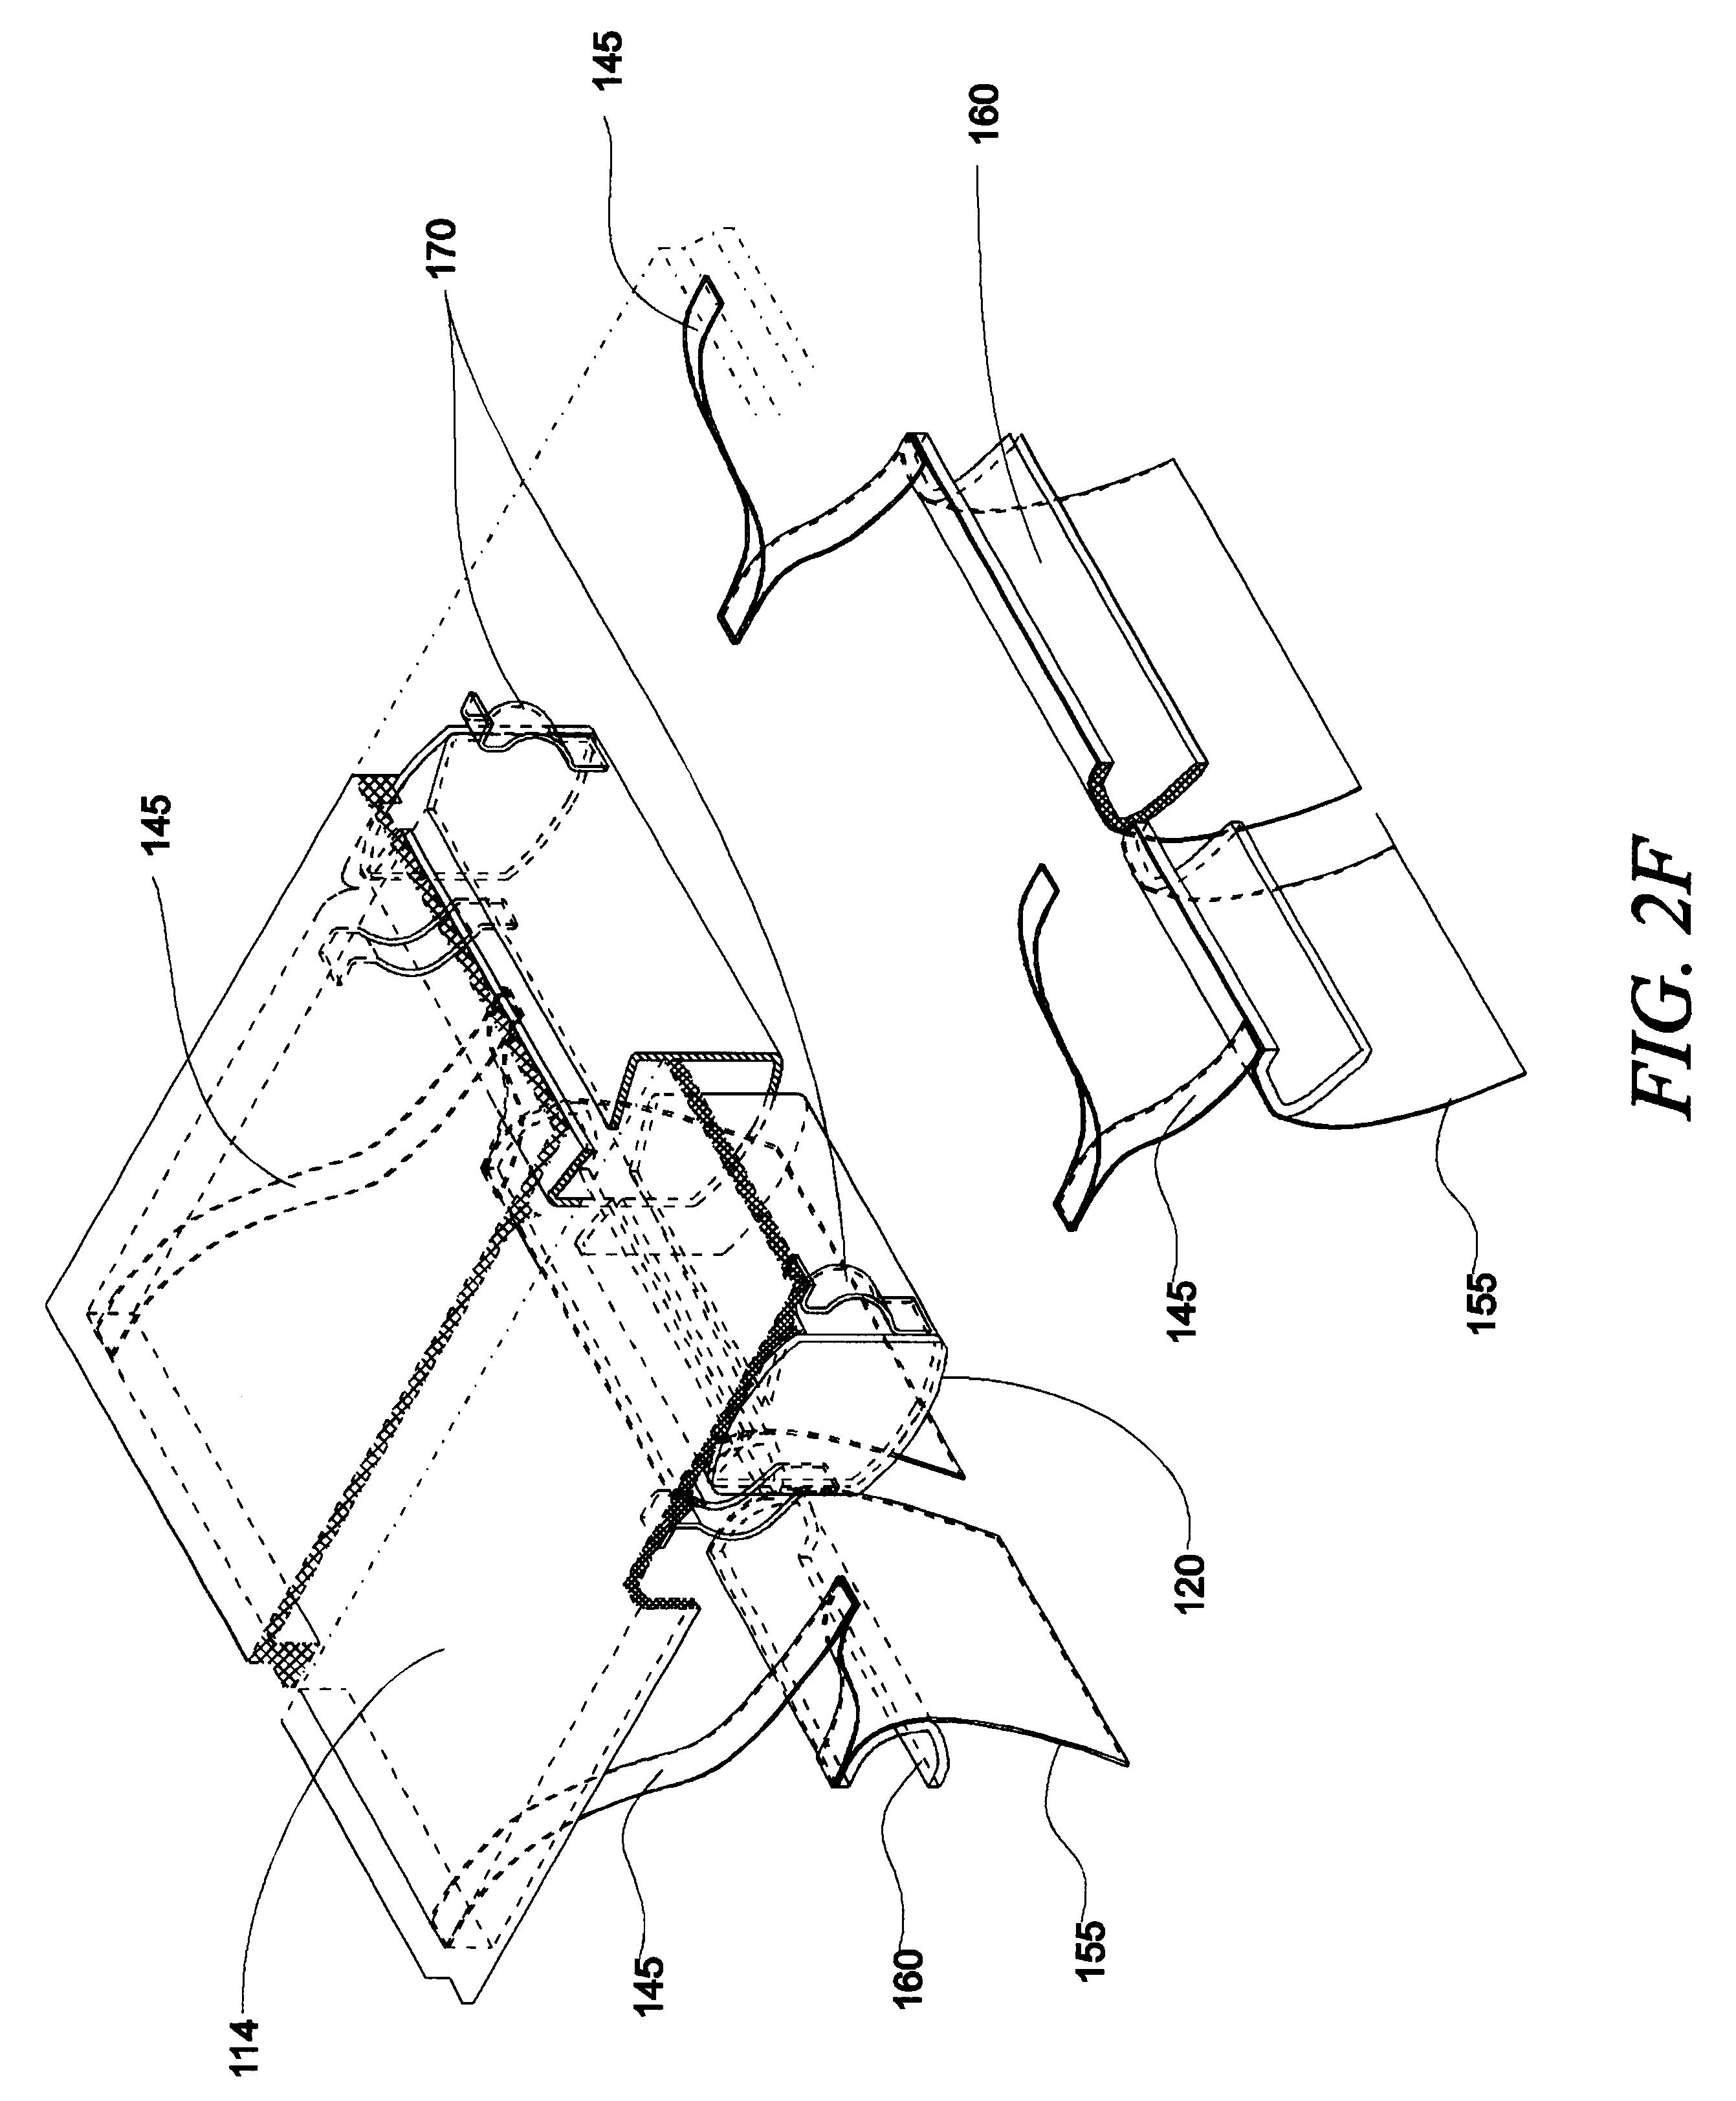 patent us 6 533 316 b2 1955 1956 Ford Tail Lights patent